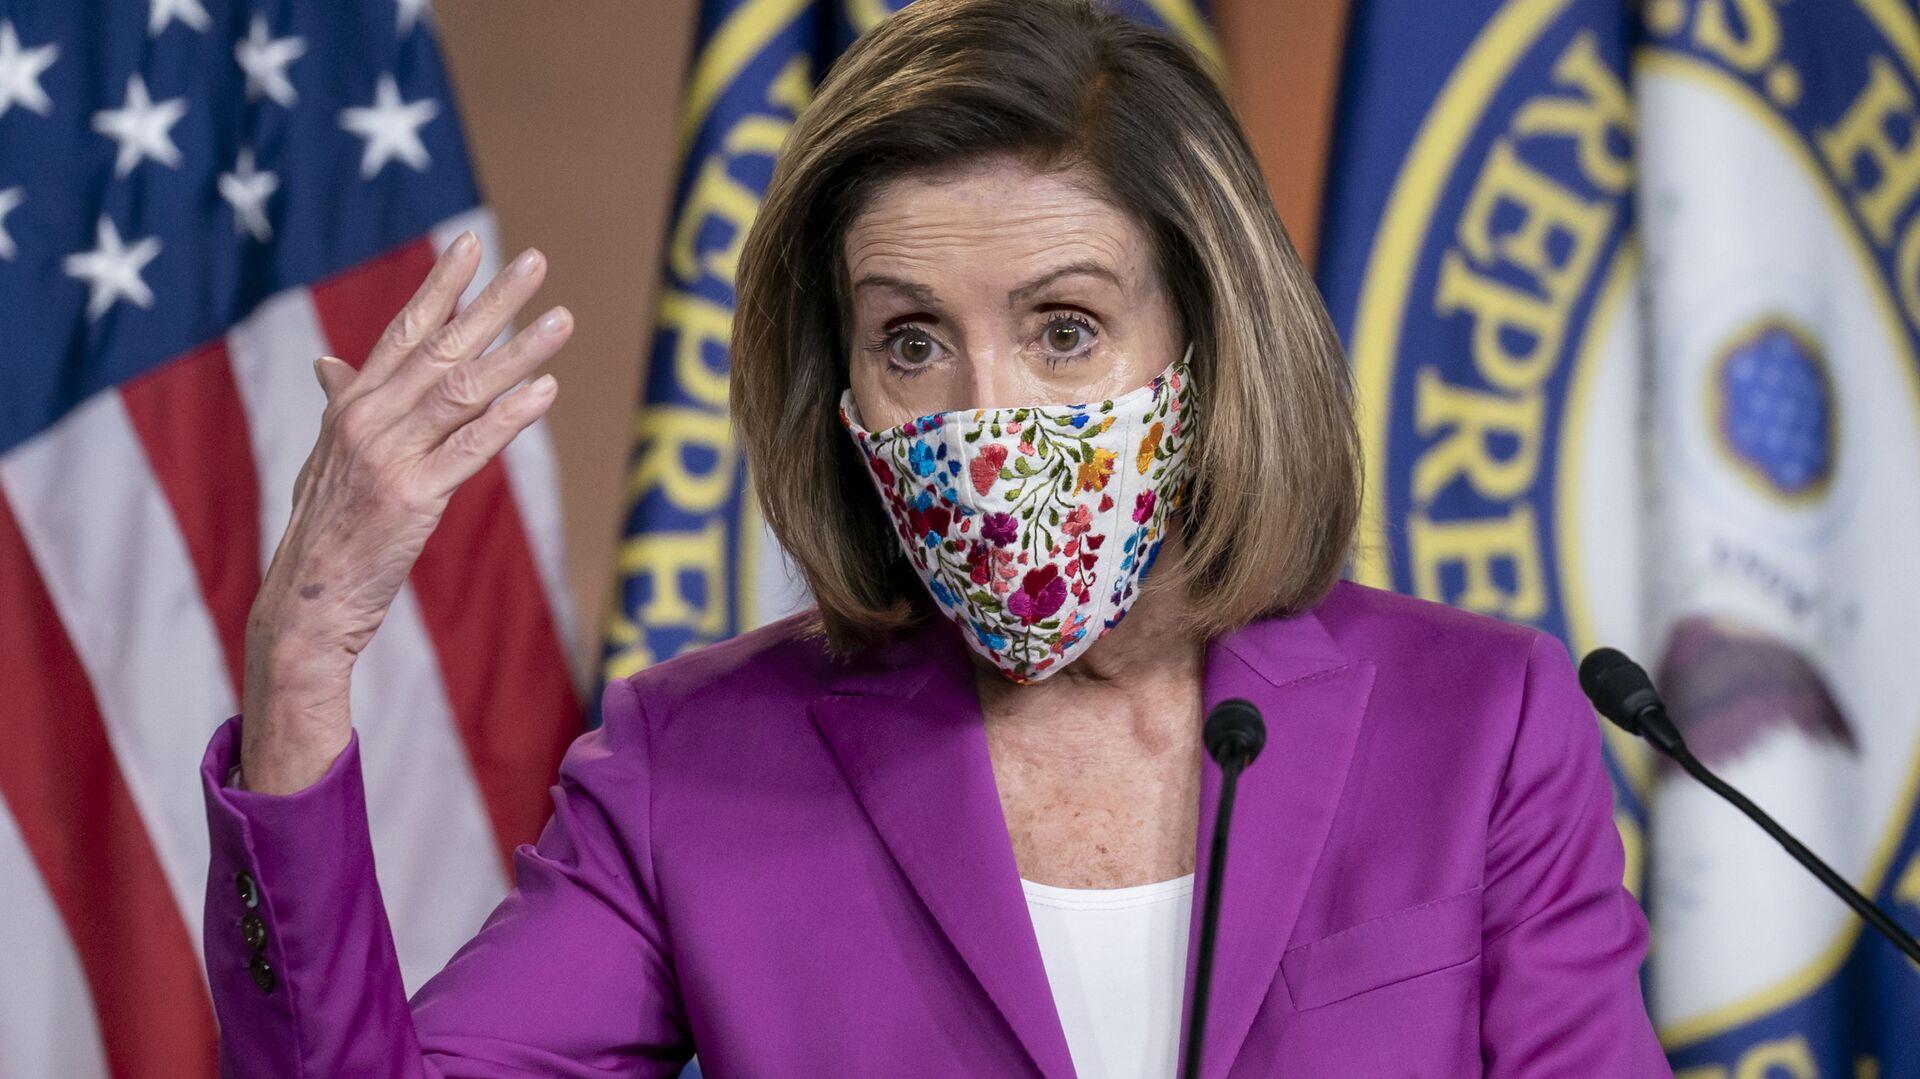 Nancy Pelosi, presidenta de la Cámara de Representantes de Estados Unidos - Sputnik Mundo, 1920, 24.06.2021